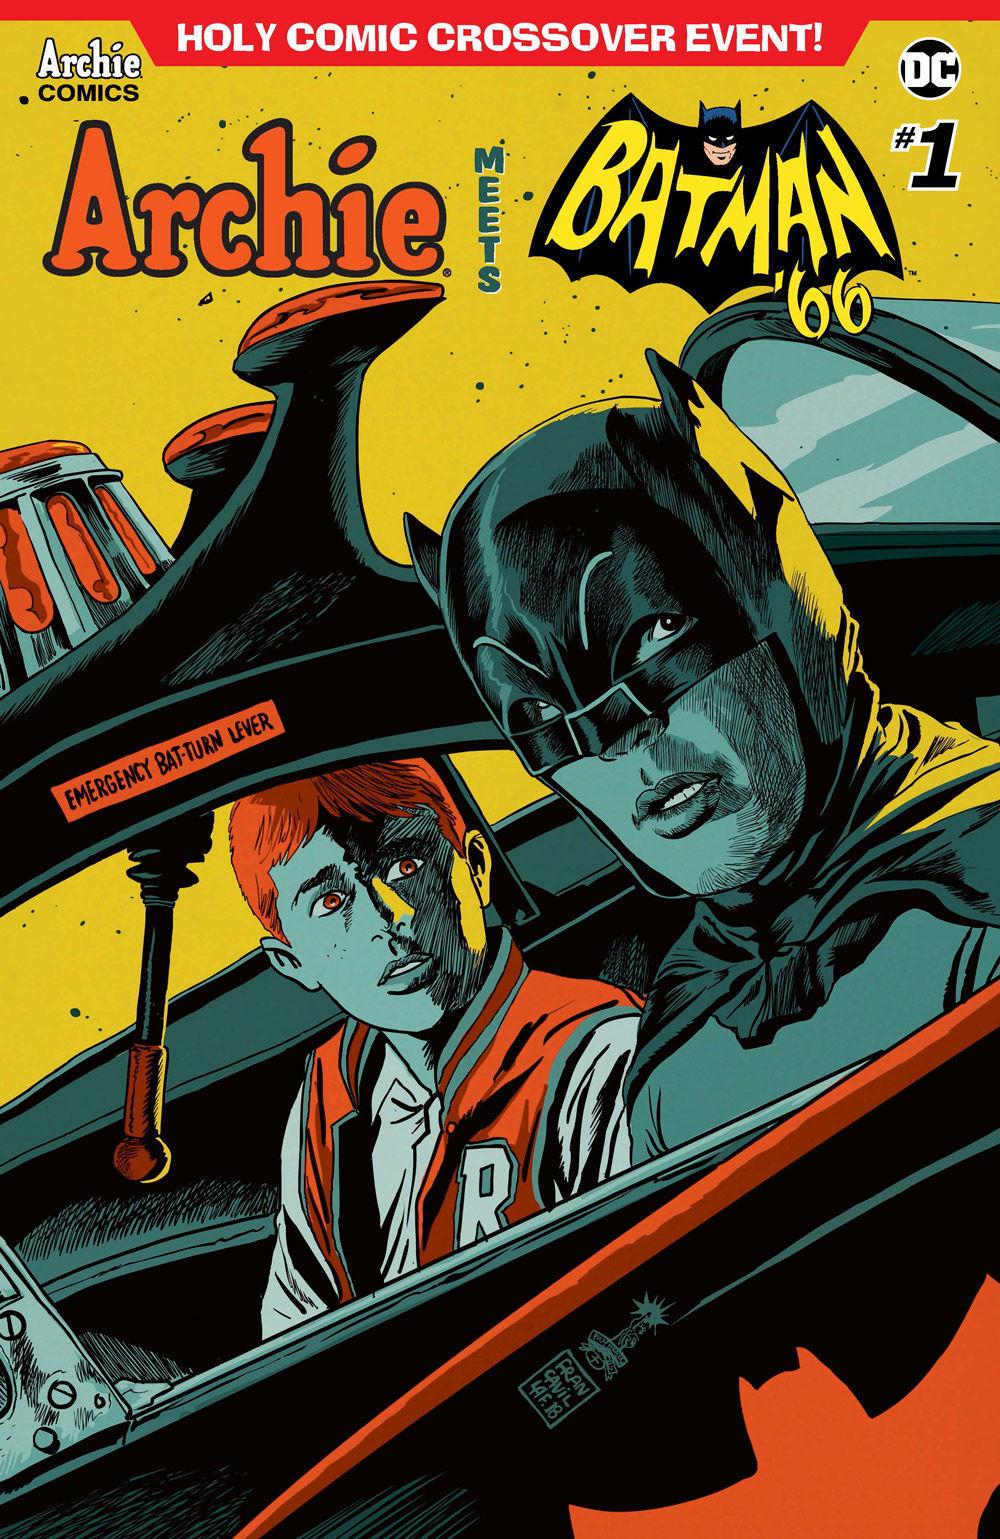 Archie Batman 66 cover.jpg